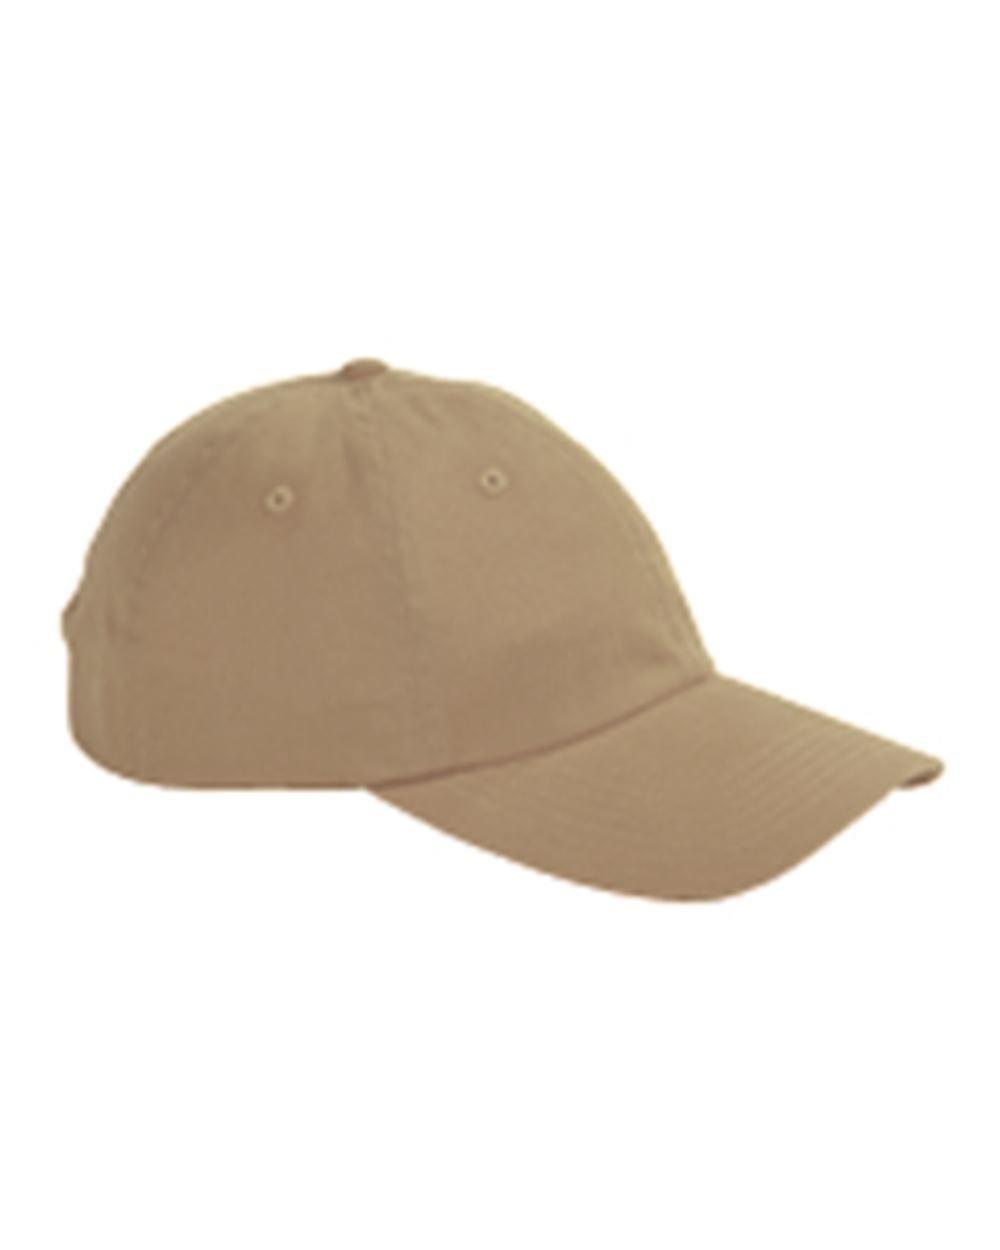 67e29a1756801 qcustom hats big accessories bx001 6-panel brushed twill unstructured custom  hat khaki